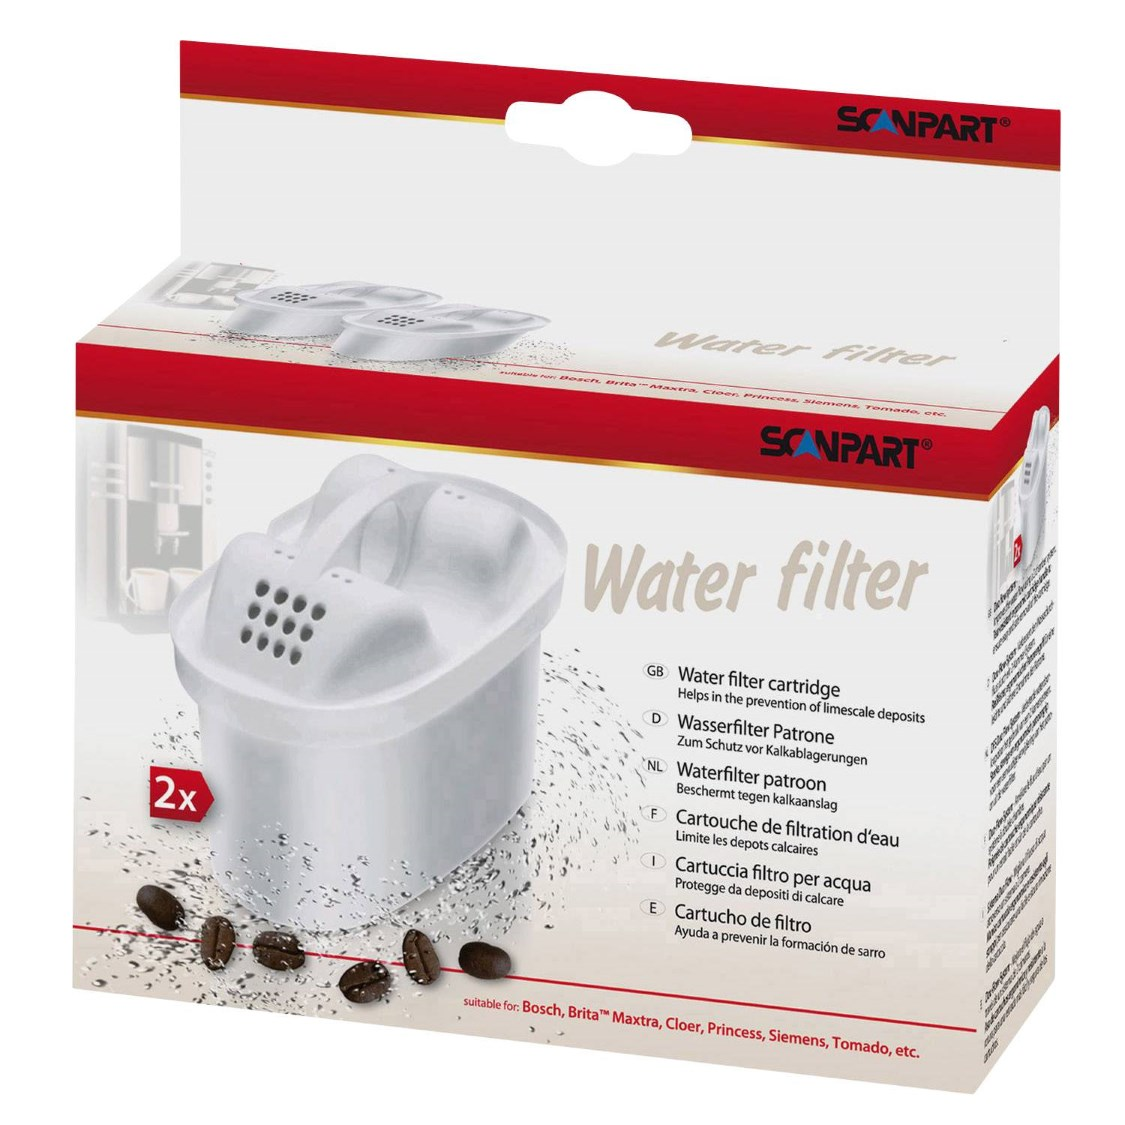 Scanpart filterpatronen - 2 stuks